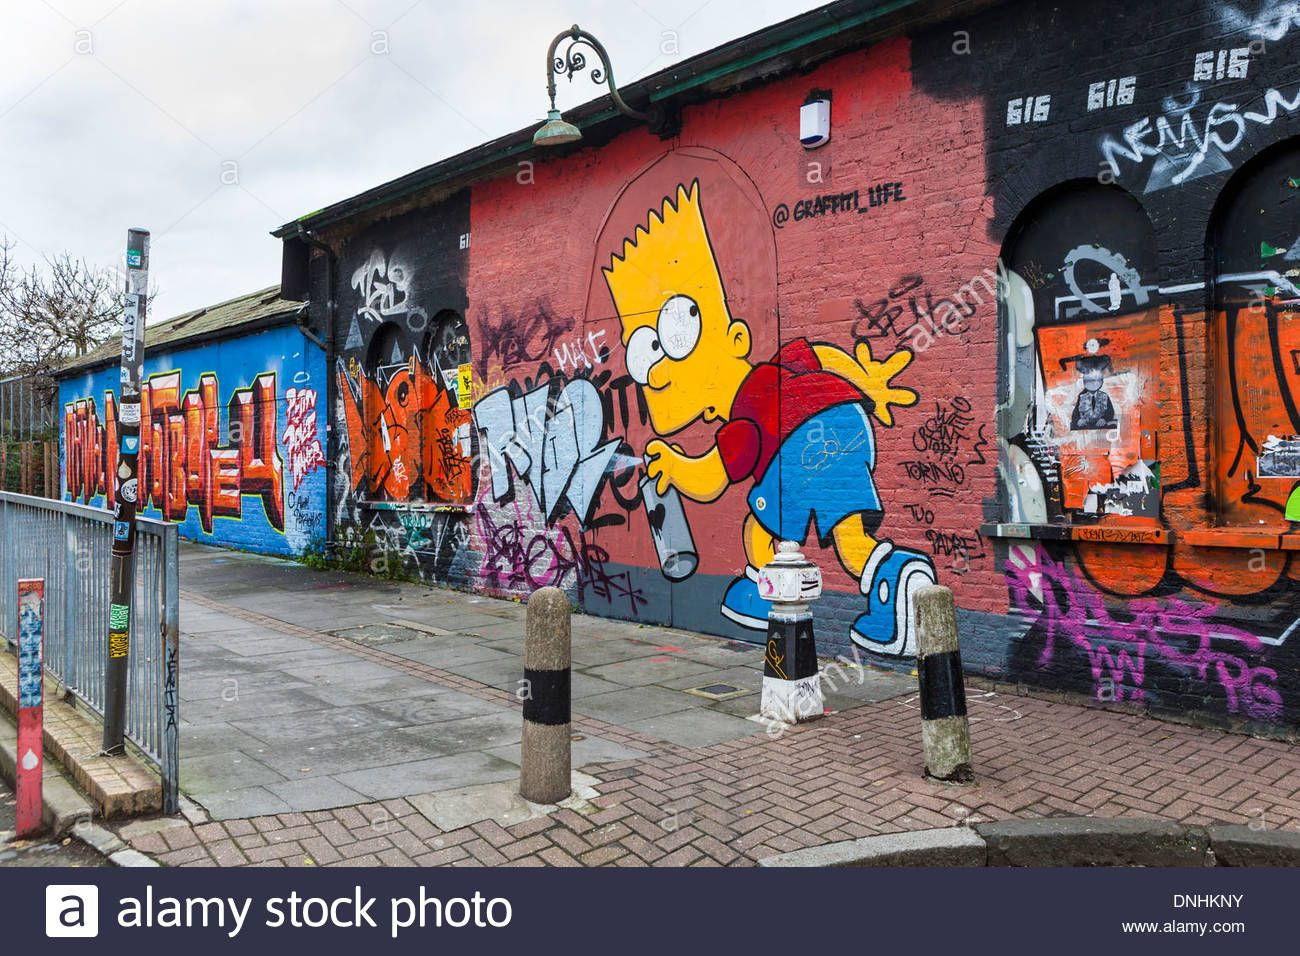 Best graffiti spray paint uk street art and graffiti tags homer simpson using spray can paint